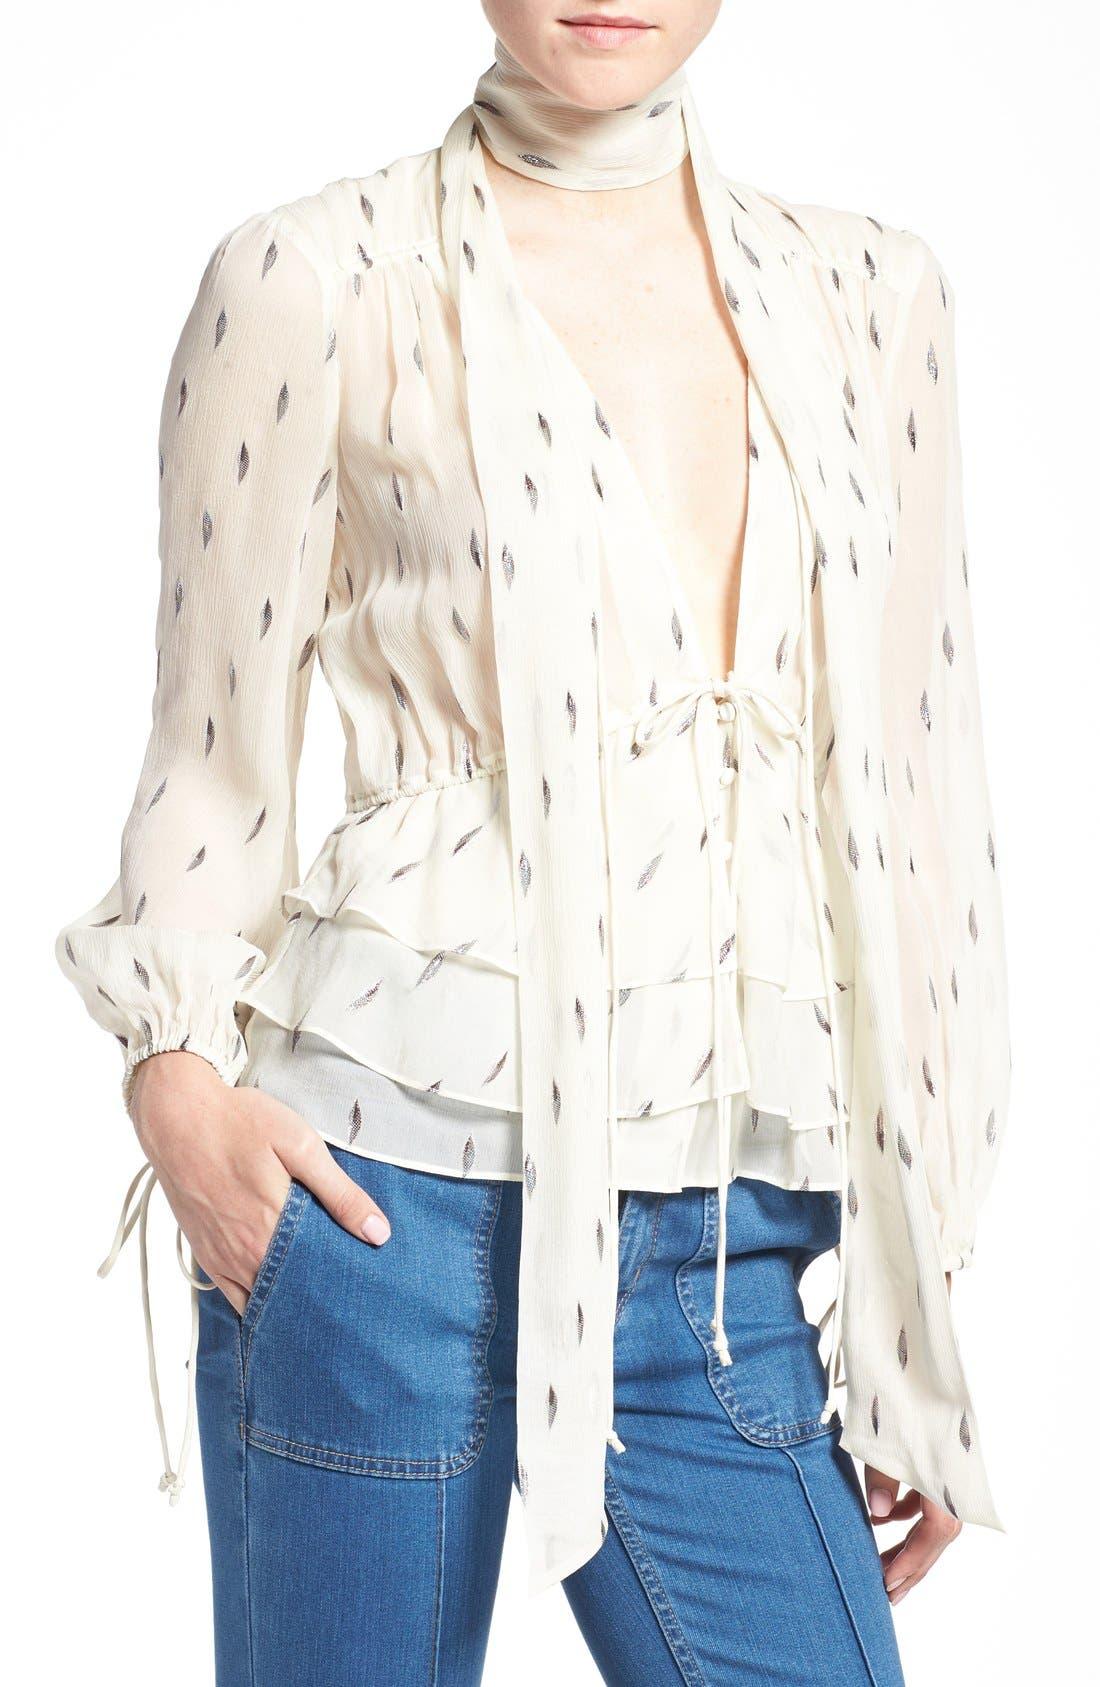 Alternate Image 1 Selected - Olivia Palermo + Chelsea28 Tie Neck Peplum Silk Top